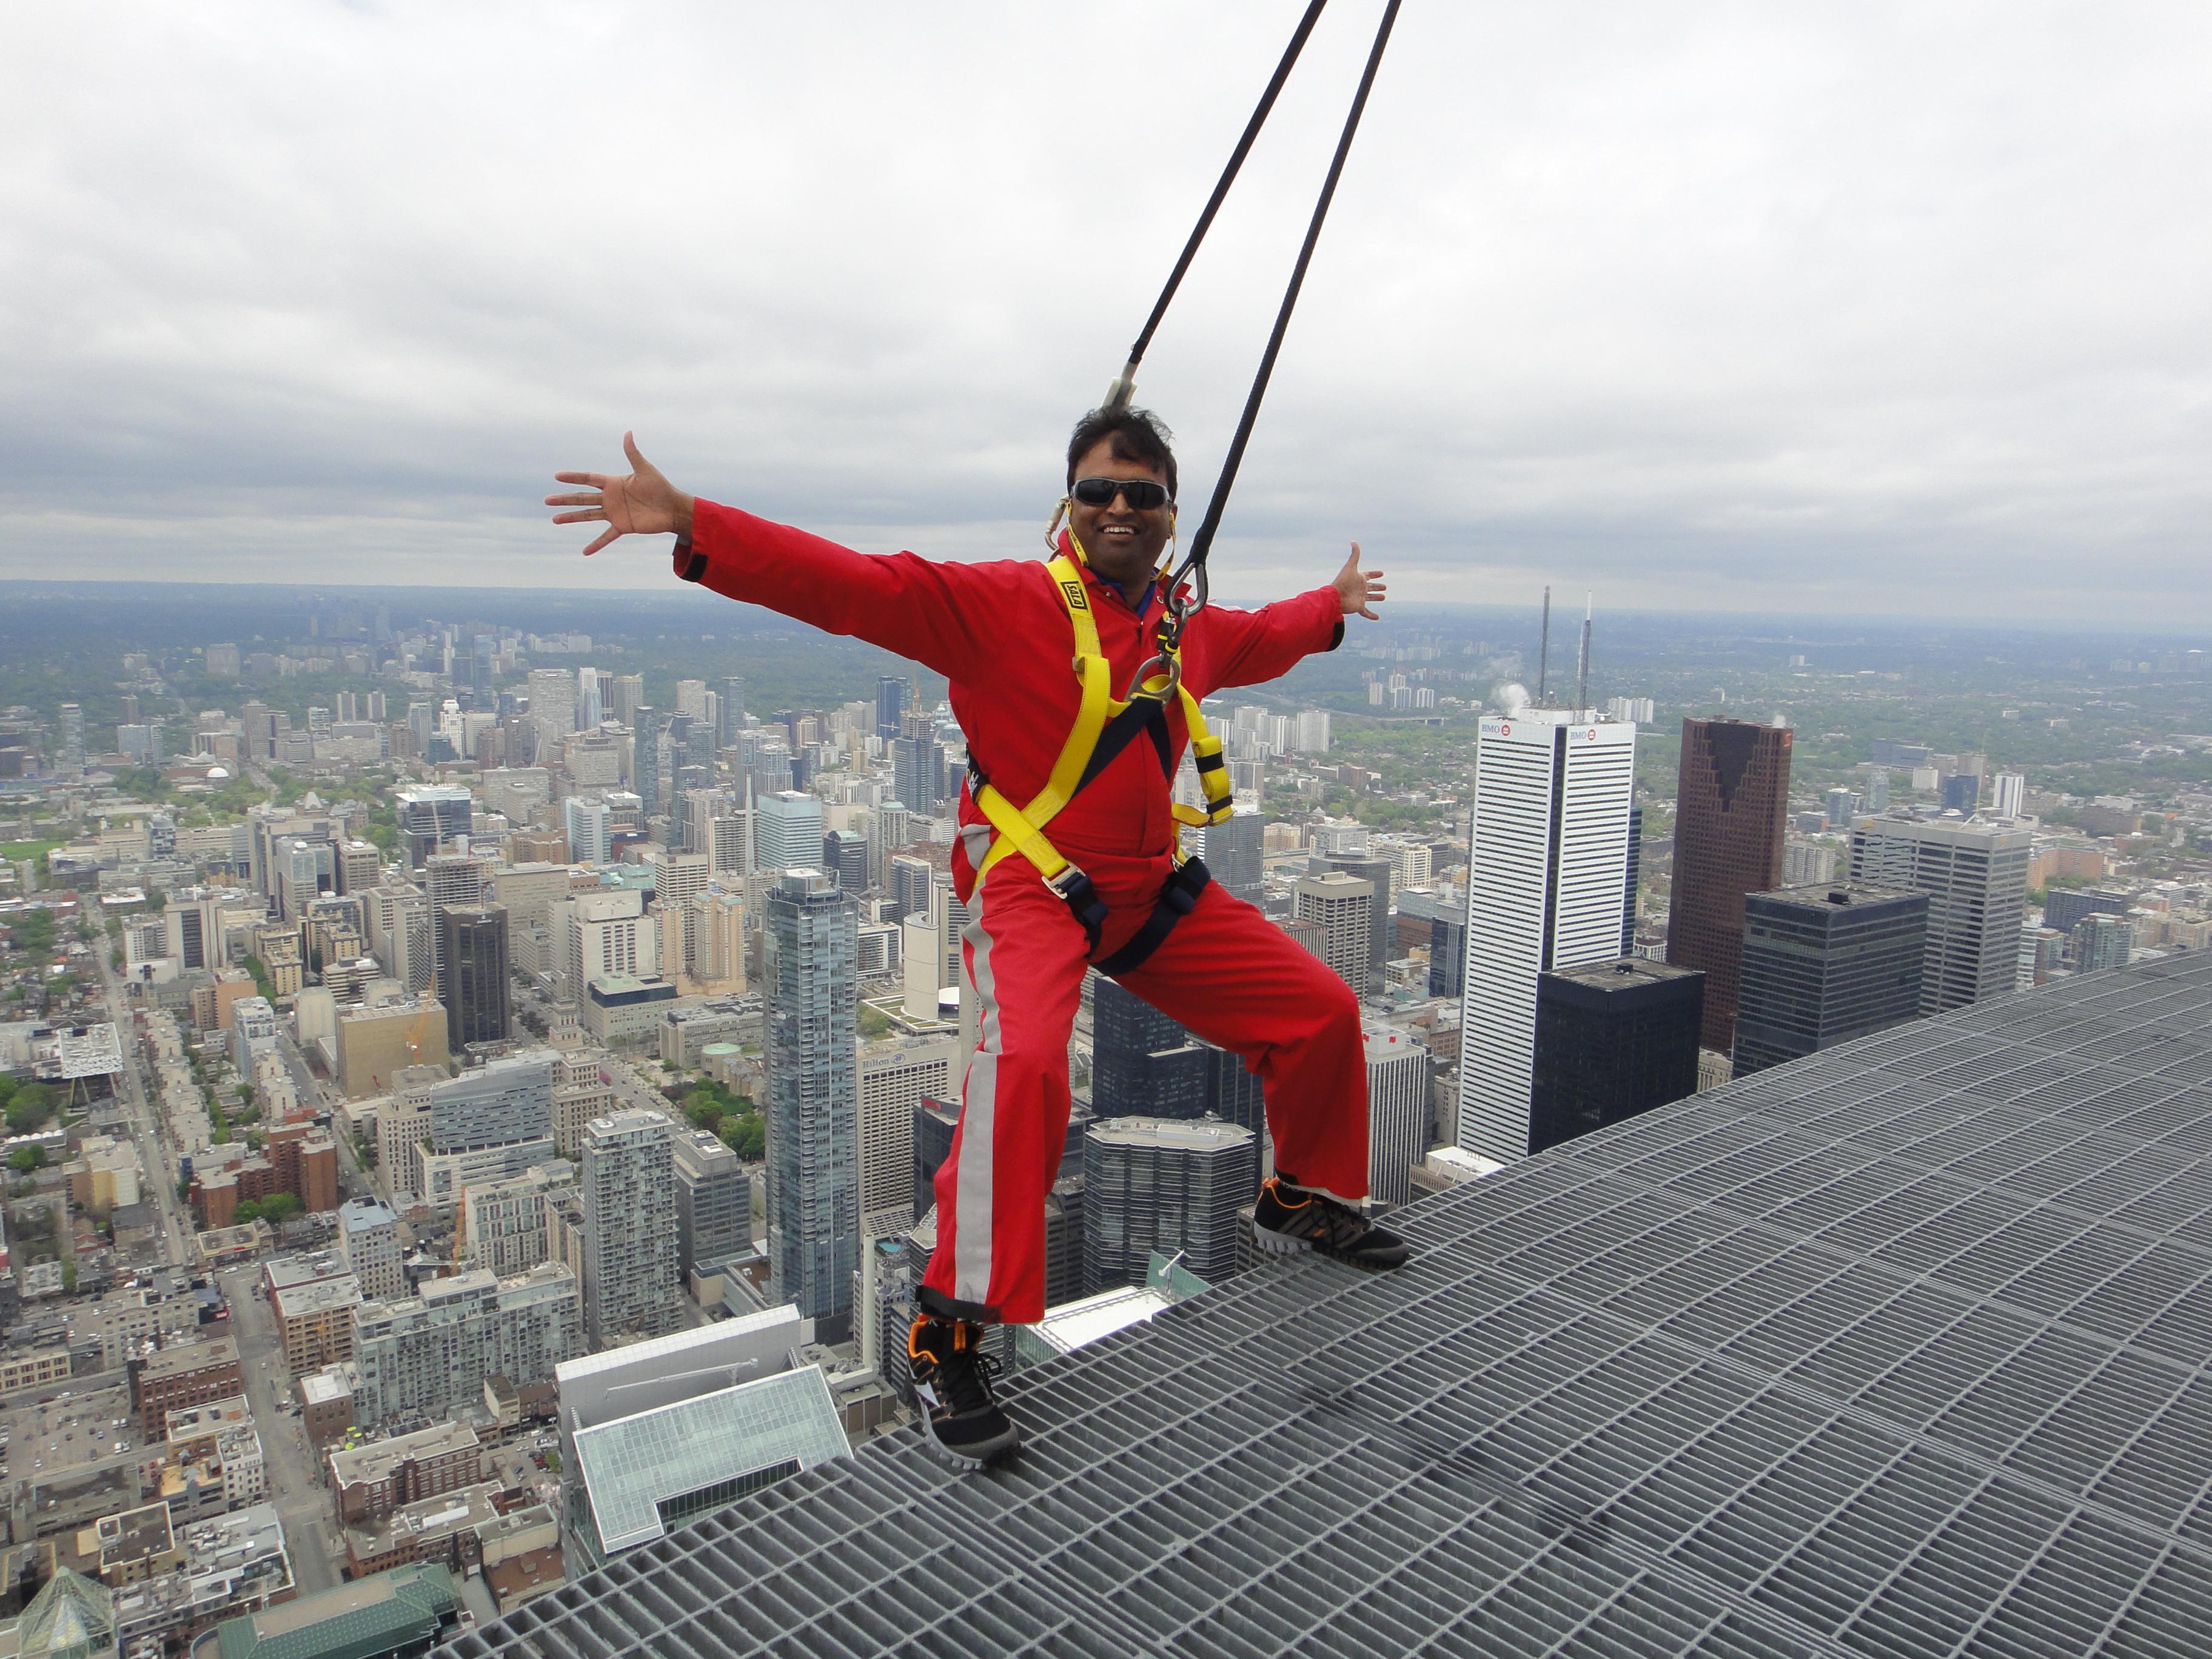 Edgewalk @ CN Tower, Toronto - Summer of 2013